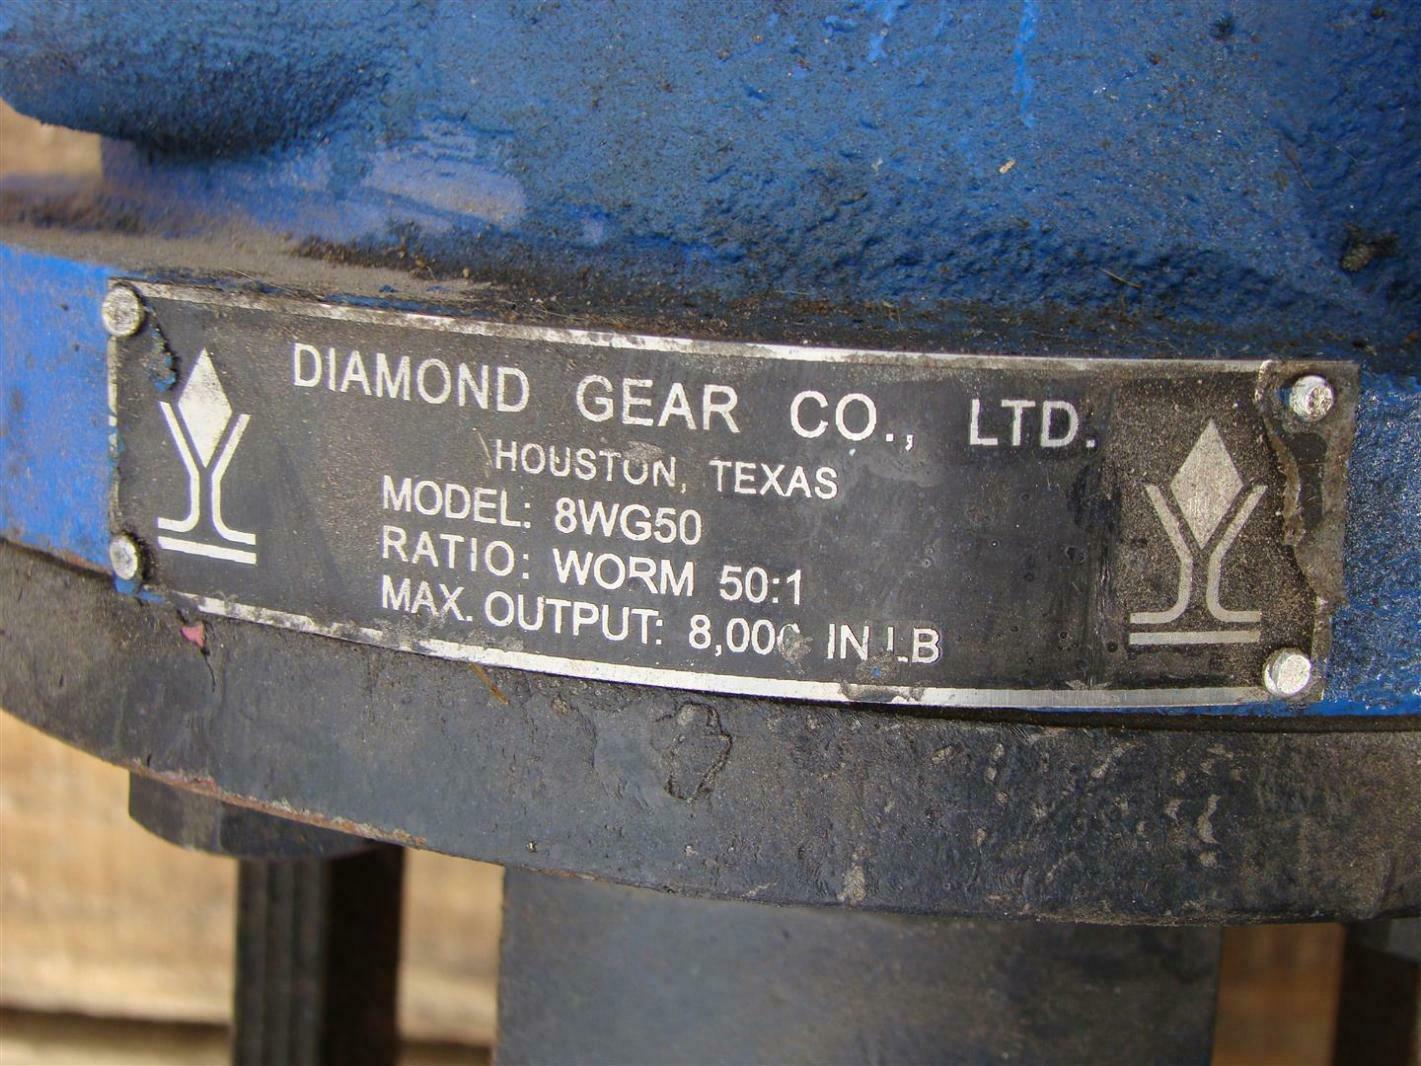 Forum PBV Size 4 150 Class Ball Valve with Diamond Gear 8WG50 Worm 50:1